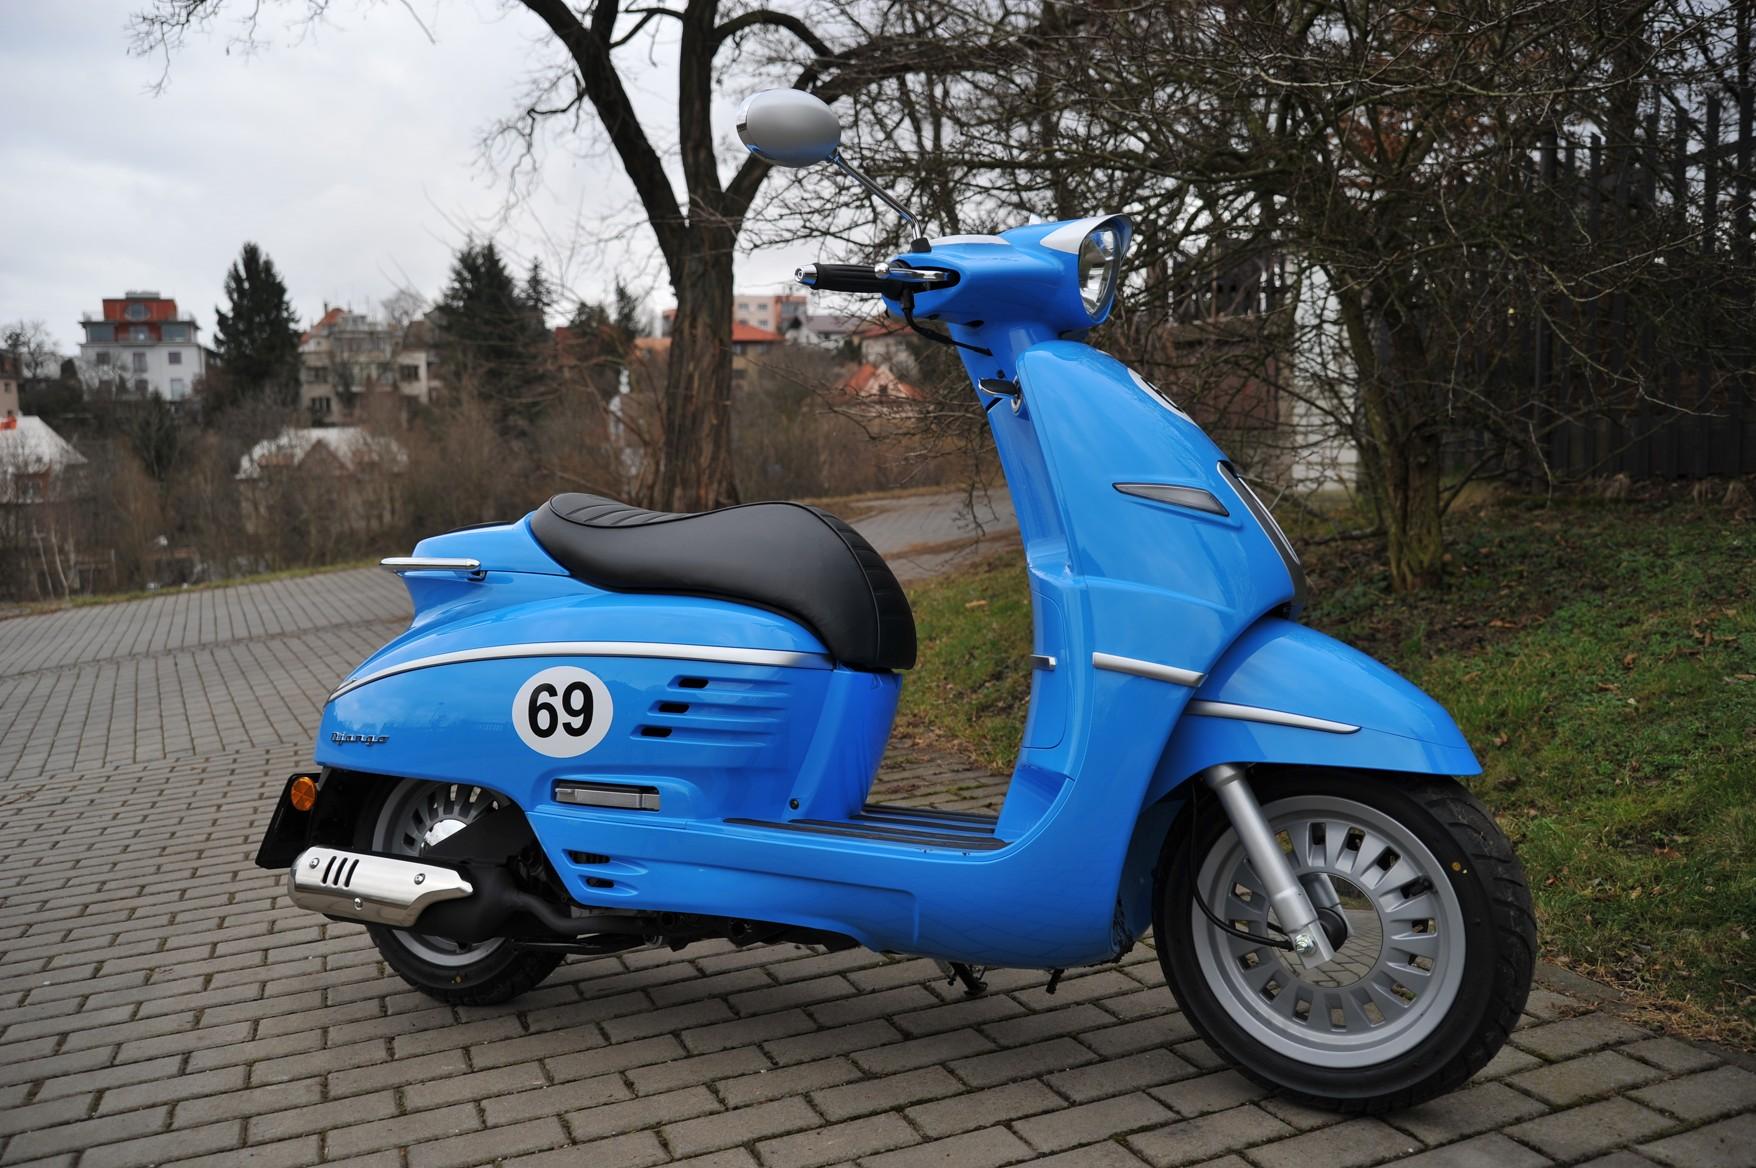 Test Zadna Divocina Peugeot Django 125 Casopis Motorbike